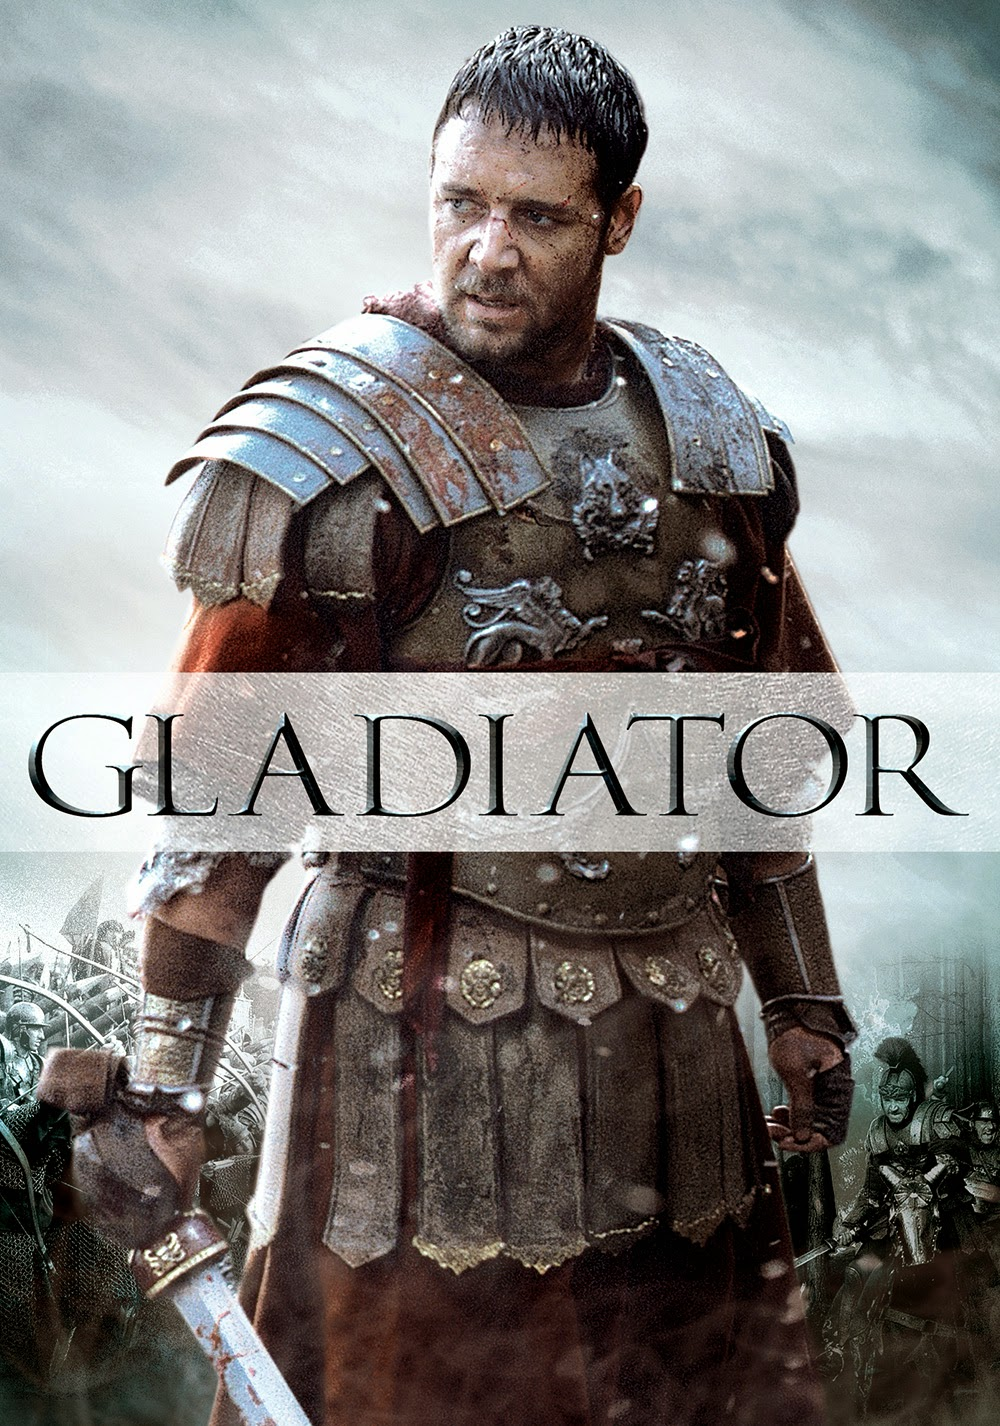 Gladiator นักรบผู้กล้า ผ่าแผ่นดินทรราช [HD][พากย์ไทย]